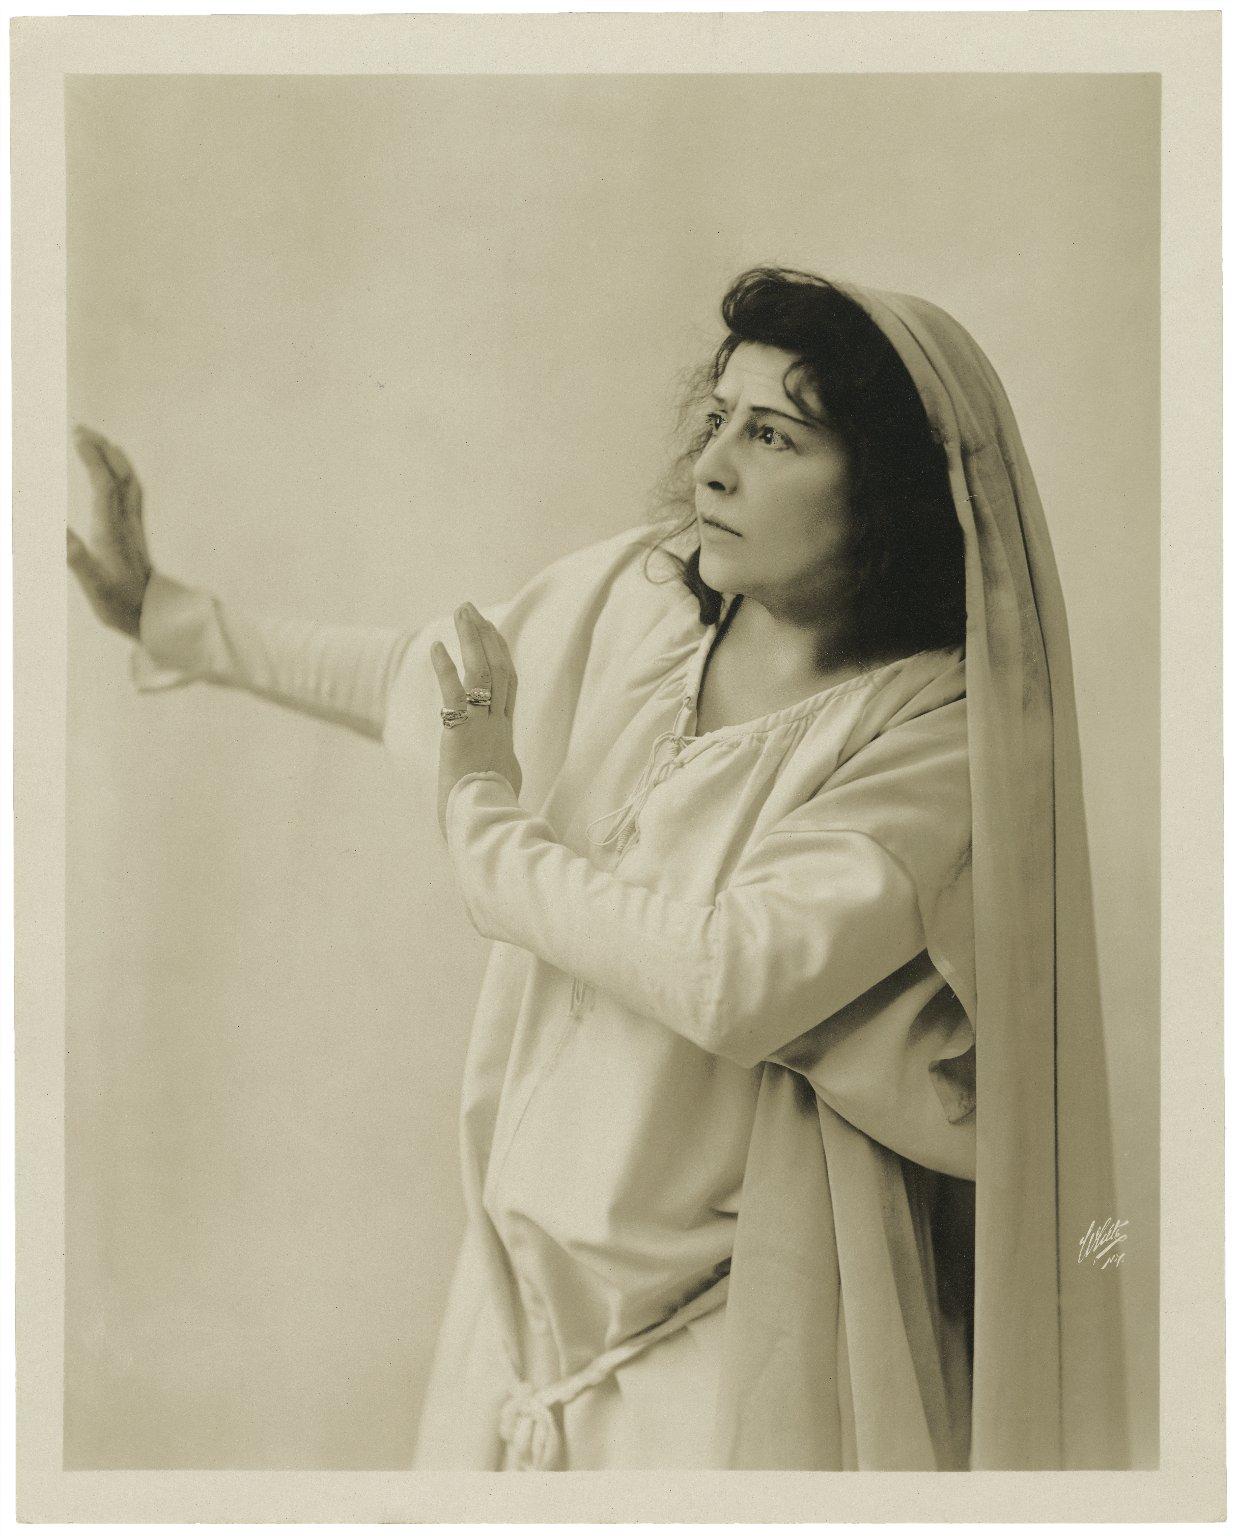 [Miss Viola Allen as Lady Macbeth] [graphic] / White, N.Y.